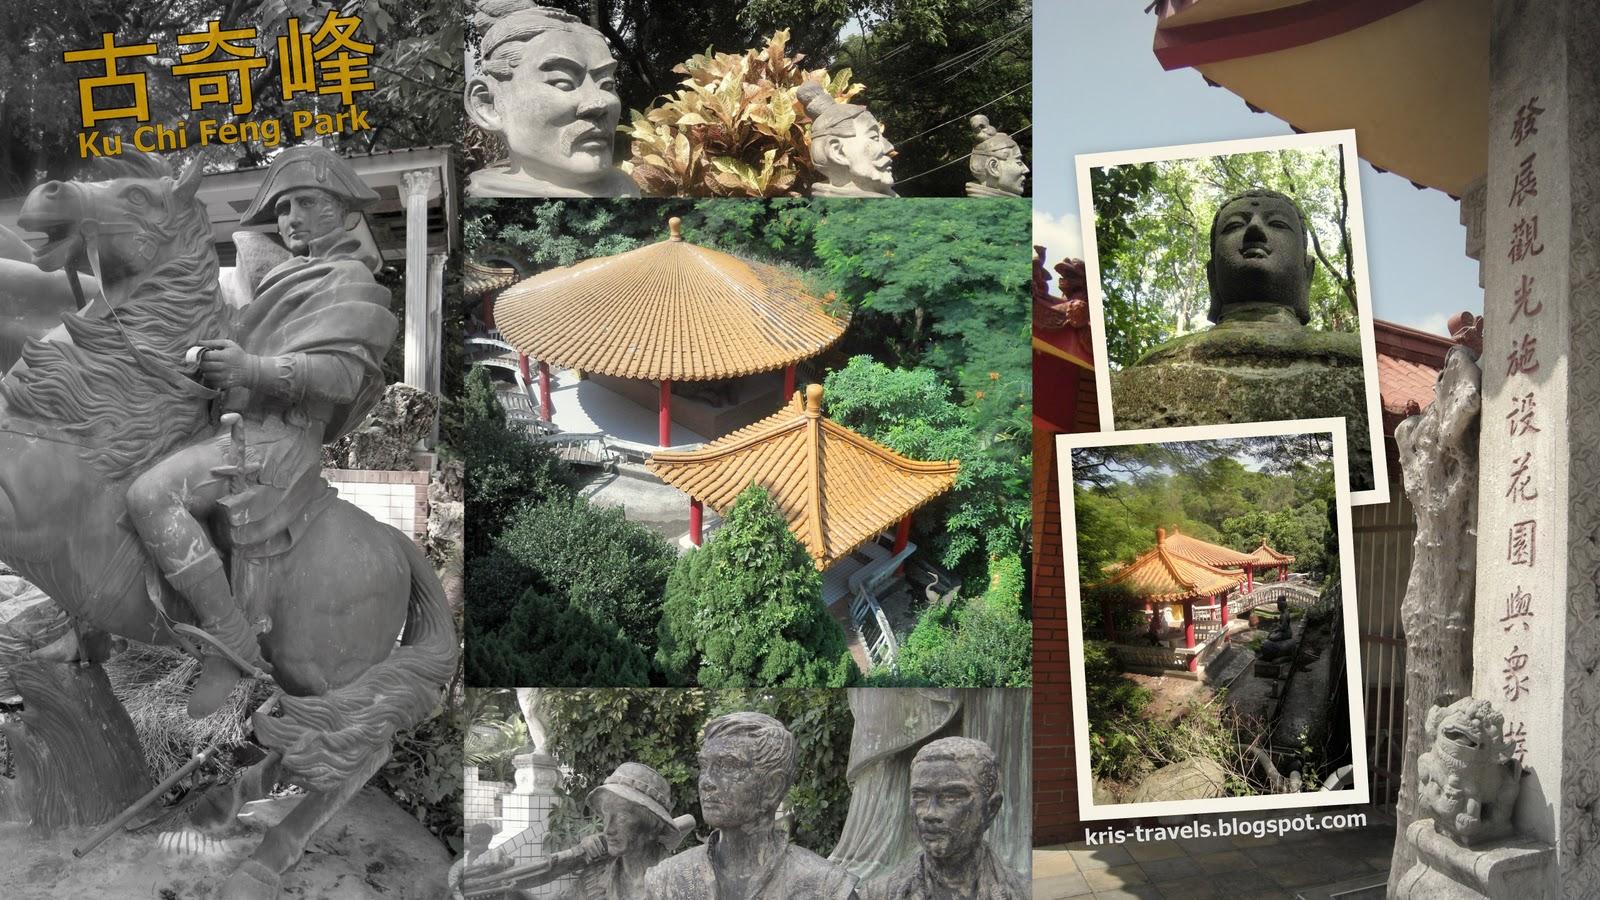 http://1.bp.blogspot.com/_UKOPc6KSUaY/TKIt_7DdmVI/AAAAAAAAAnA/ryt9TjbvT6M/s1600/Ku+Chi+Feng.jpg